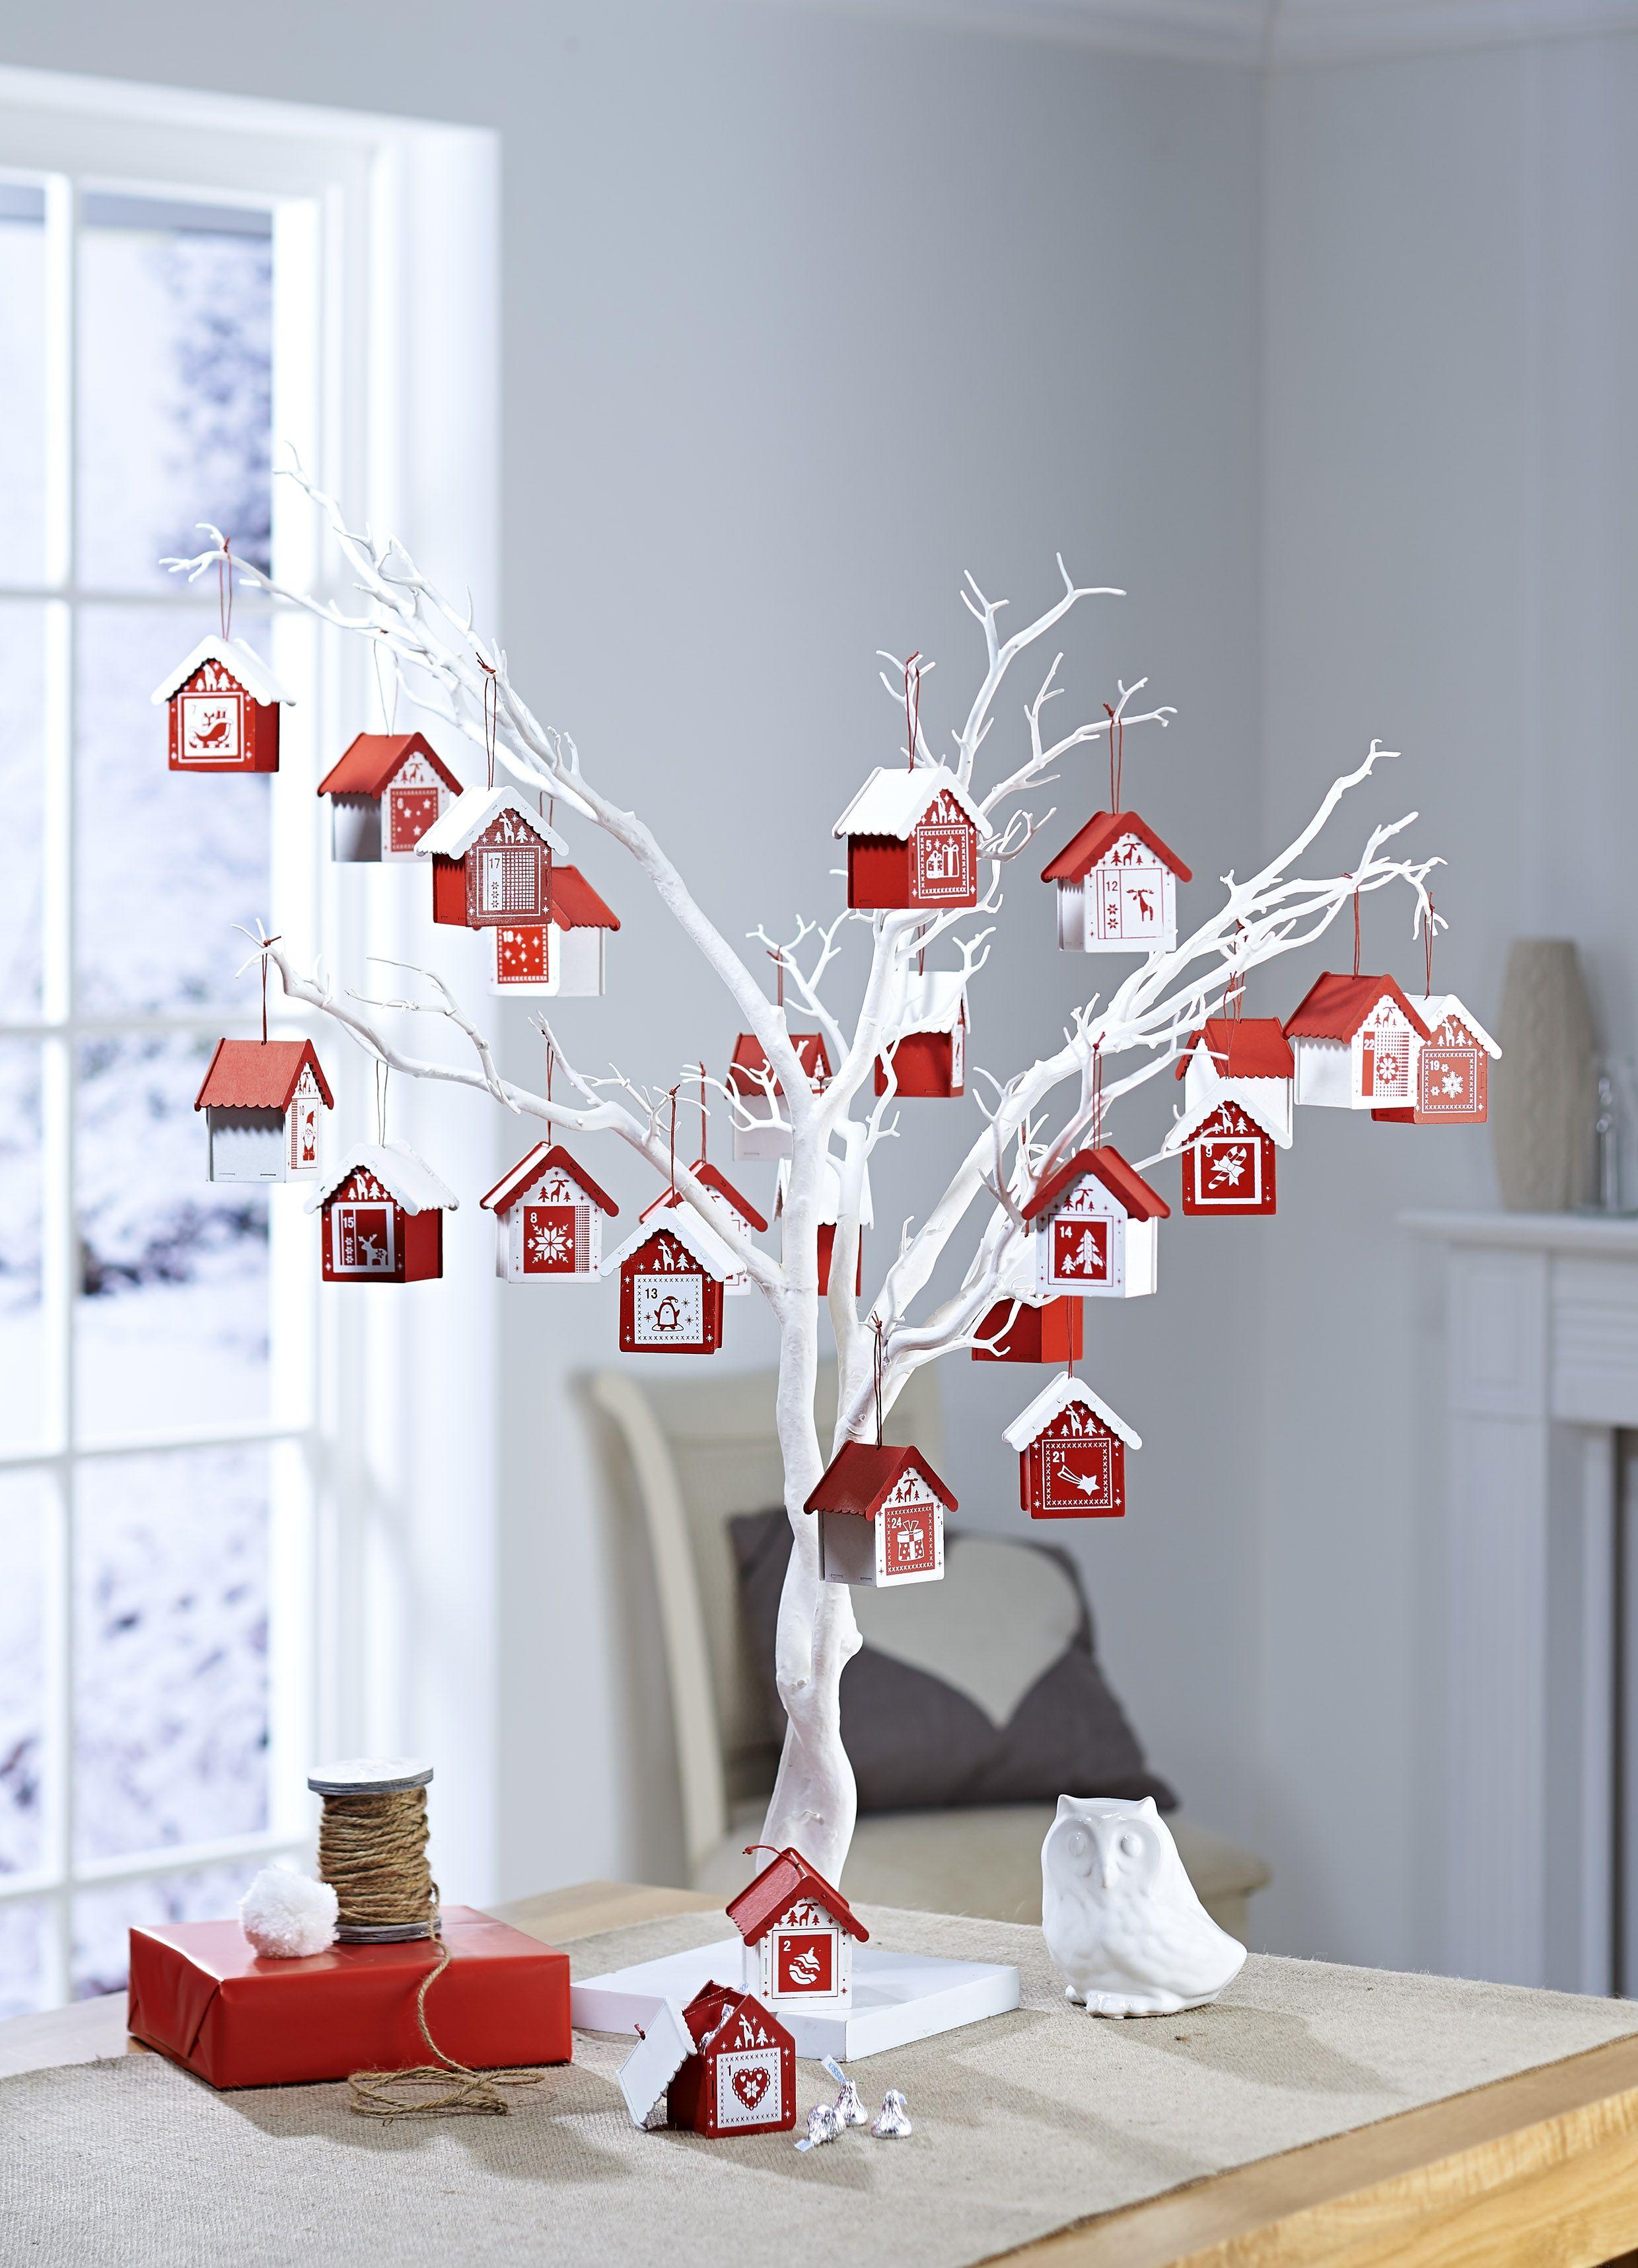 #ChristmasTreeAdventCalendar #DIYChristmas #DIYAdvent #AdventCalendar #CreativeChristmas